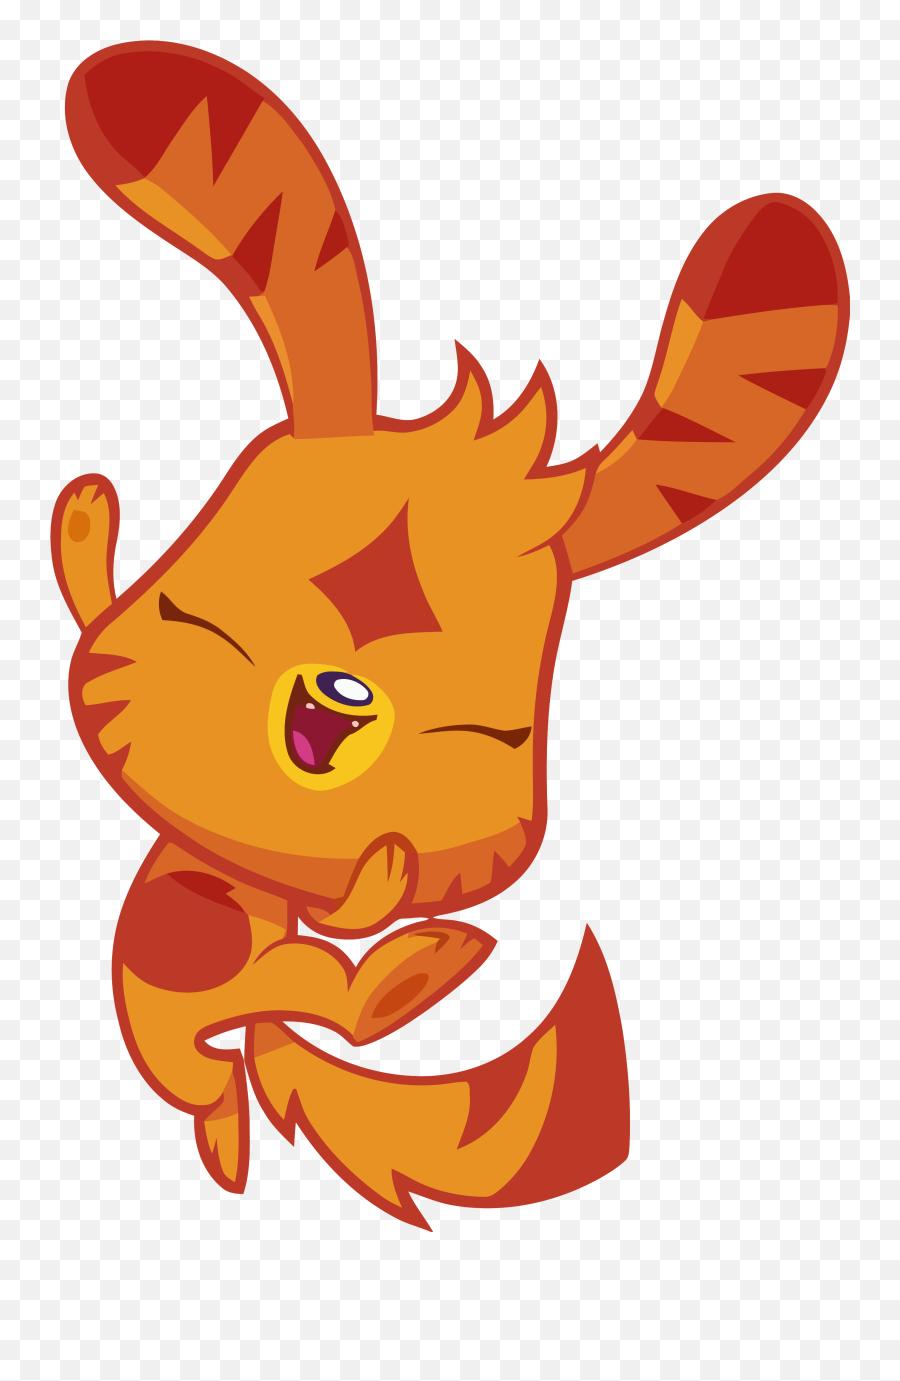 Katsuma Joy Clipart Png Transparent Png - Large Size Png Katsuma Moshi Monsters Png Emoji,Joy Emoji Png